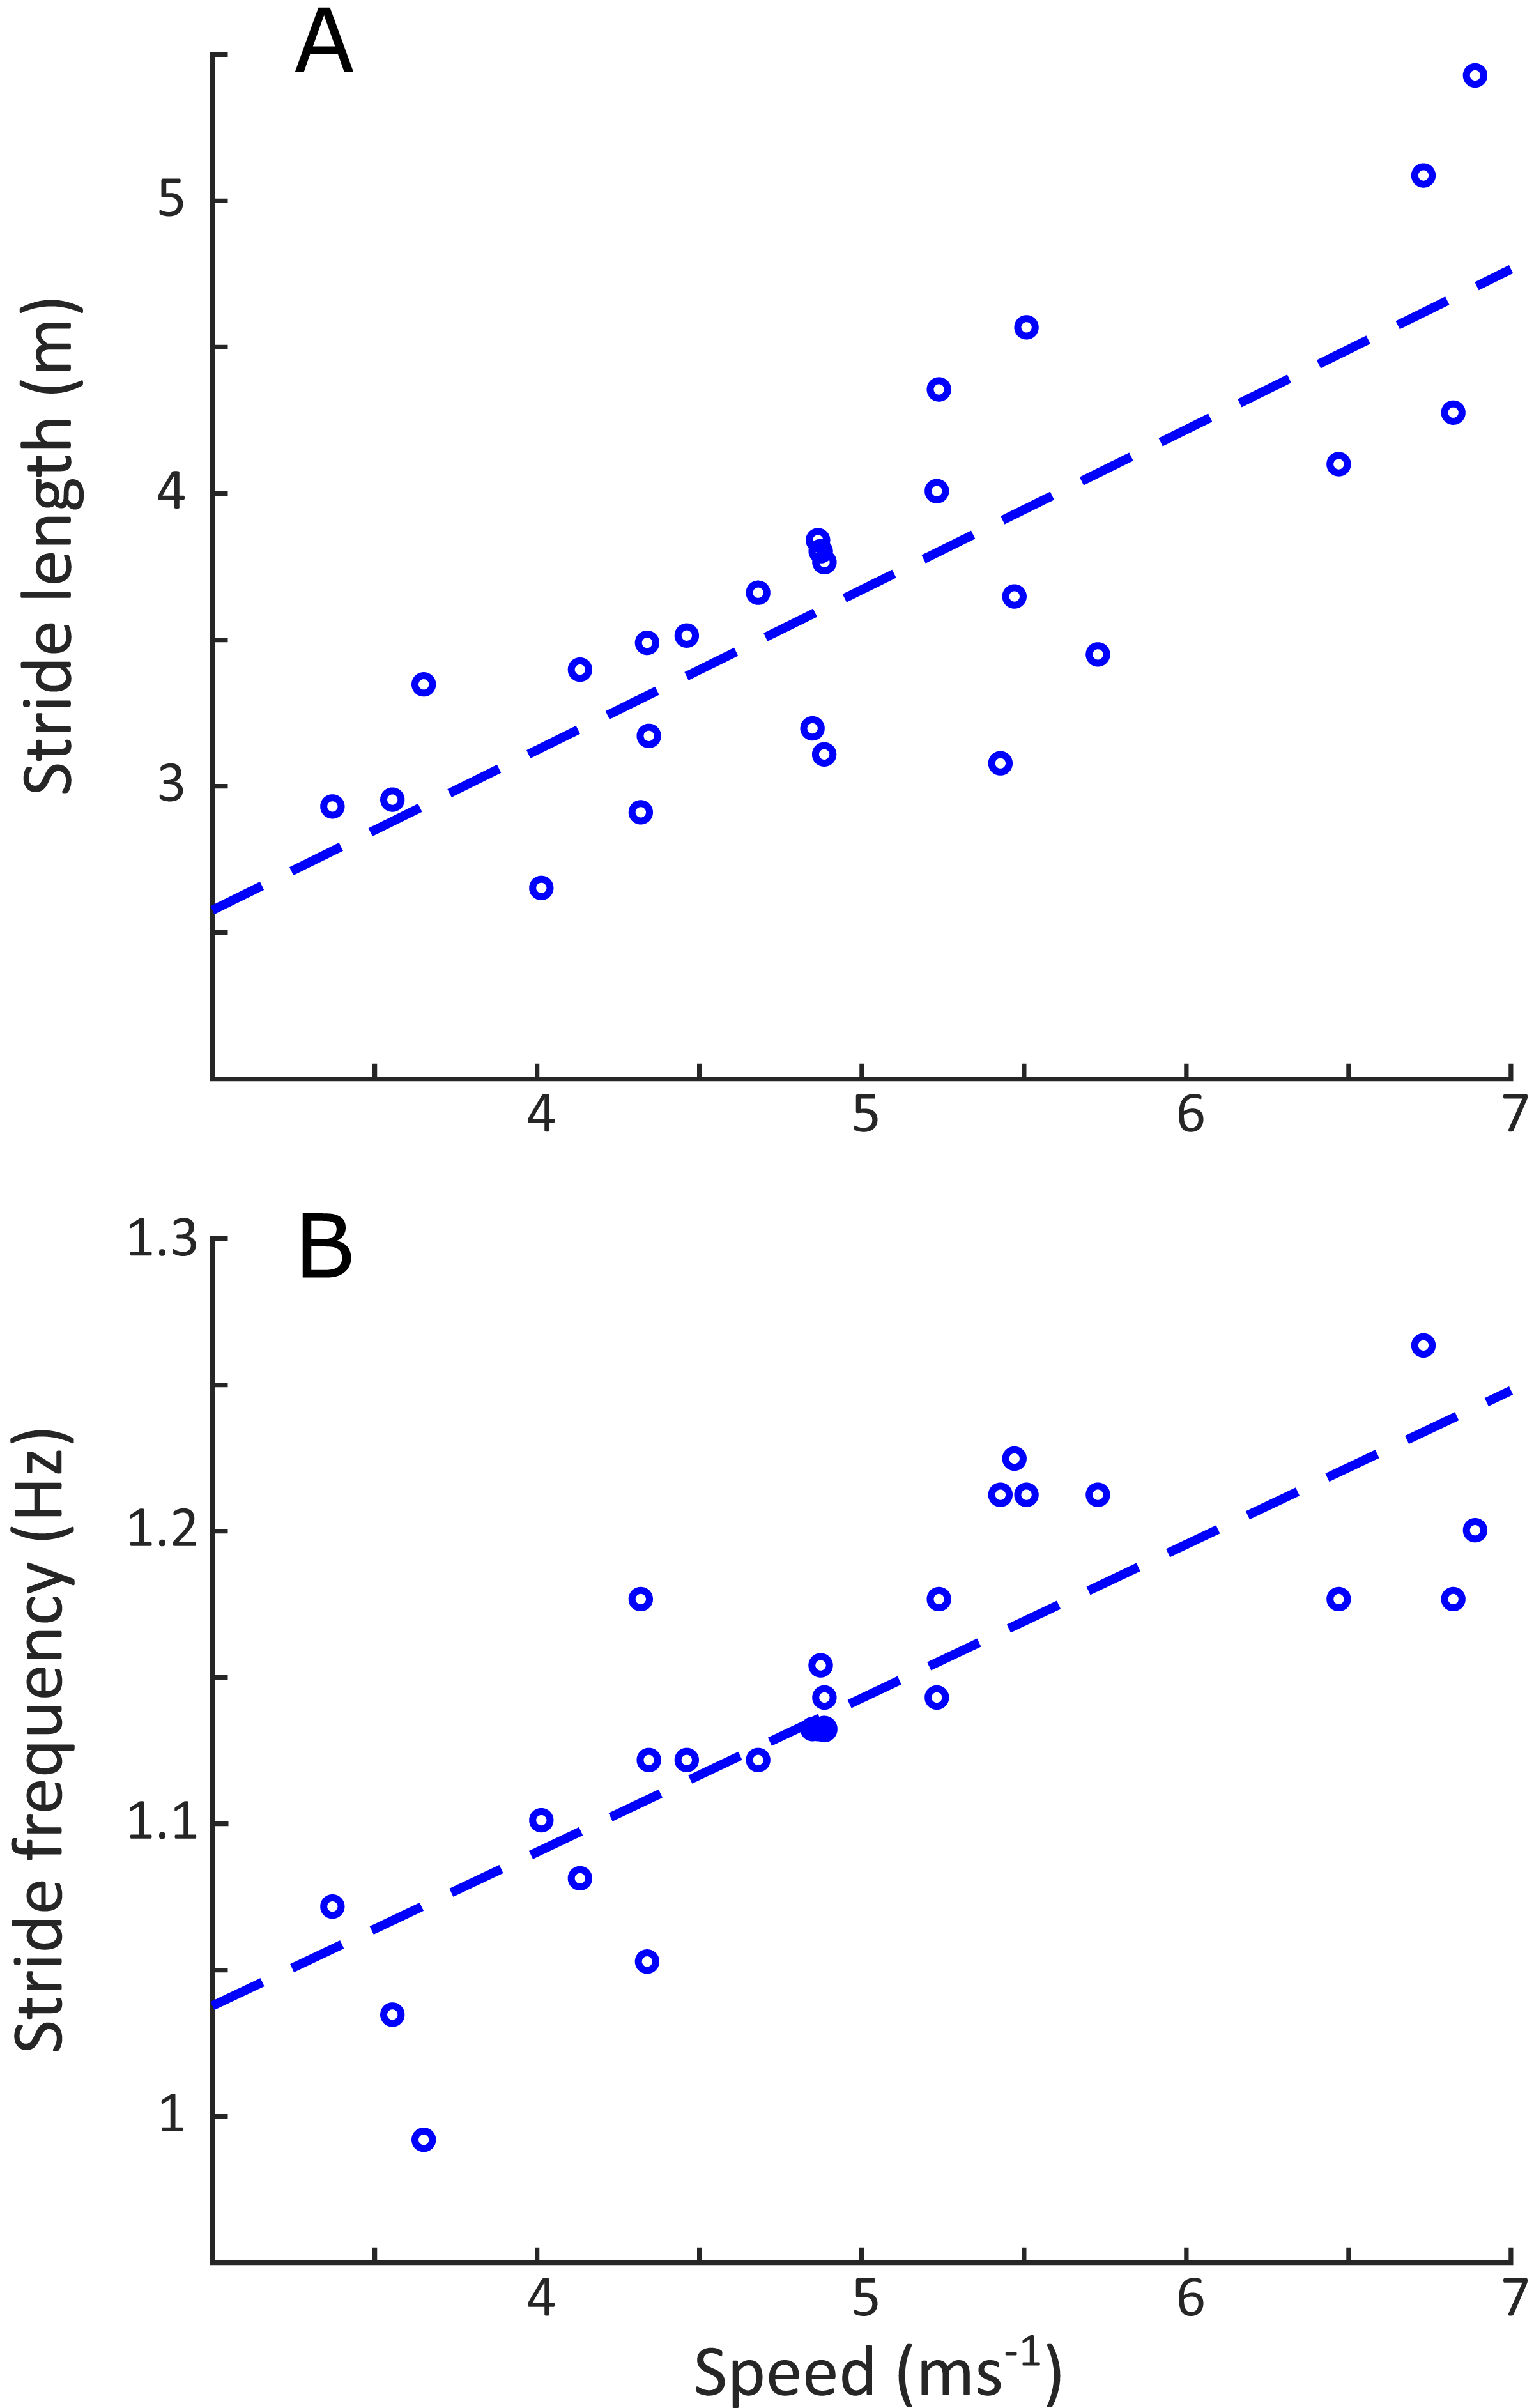 The running kinematics of free-roaming giraffes, measured using a